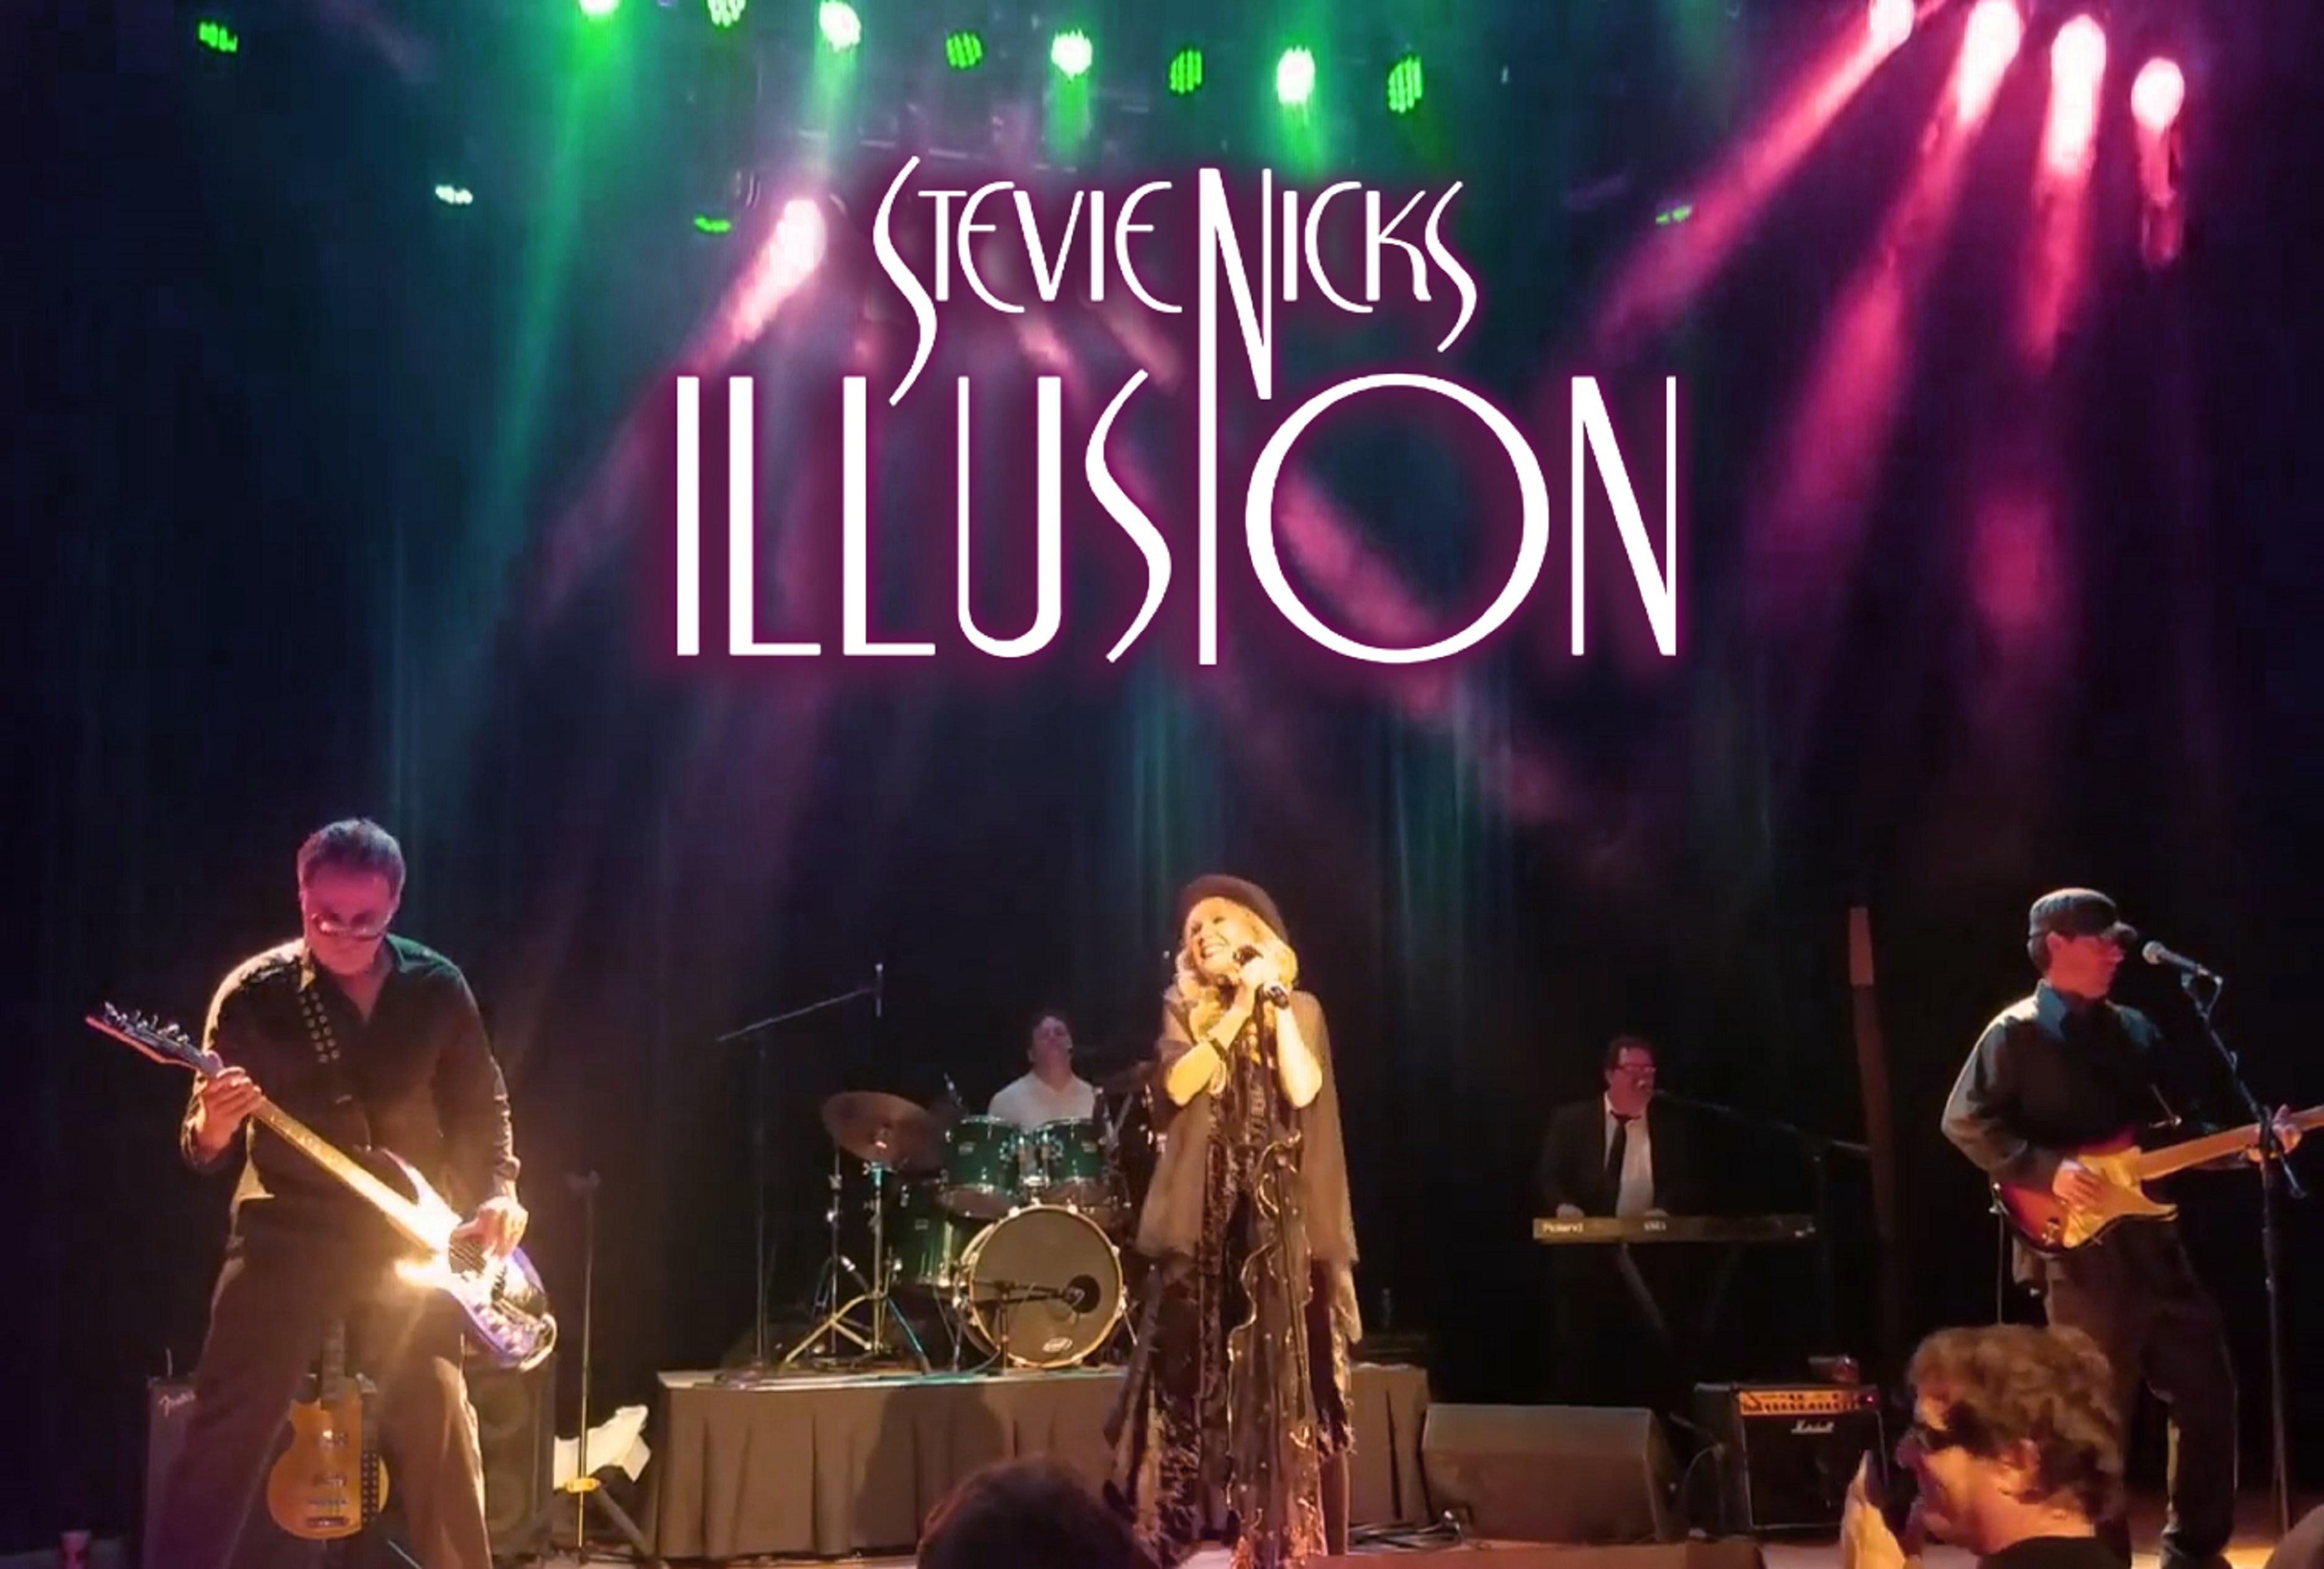 Stevie Nicks Illusion